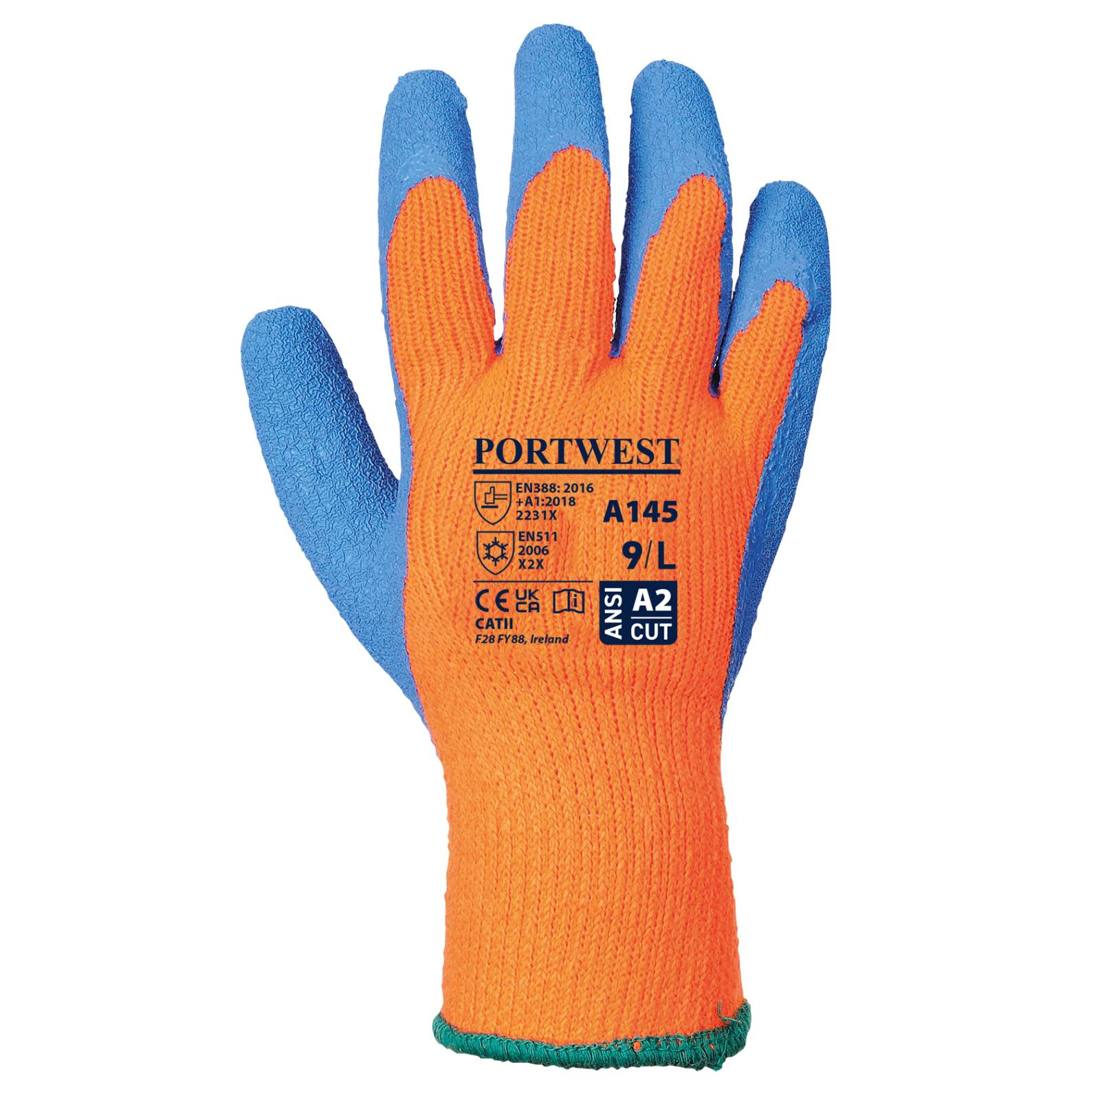 Portwest Handschoenen A145 oranje-blauw(OB)